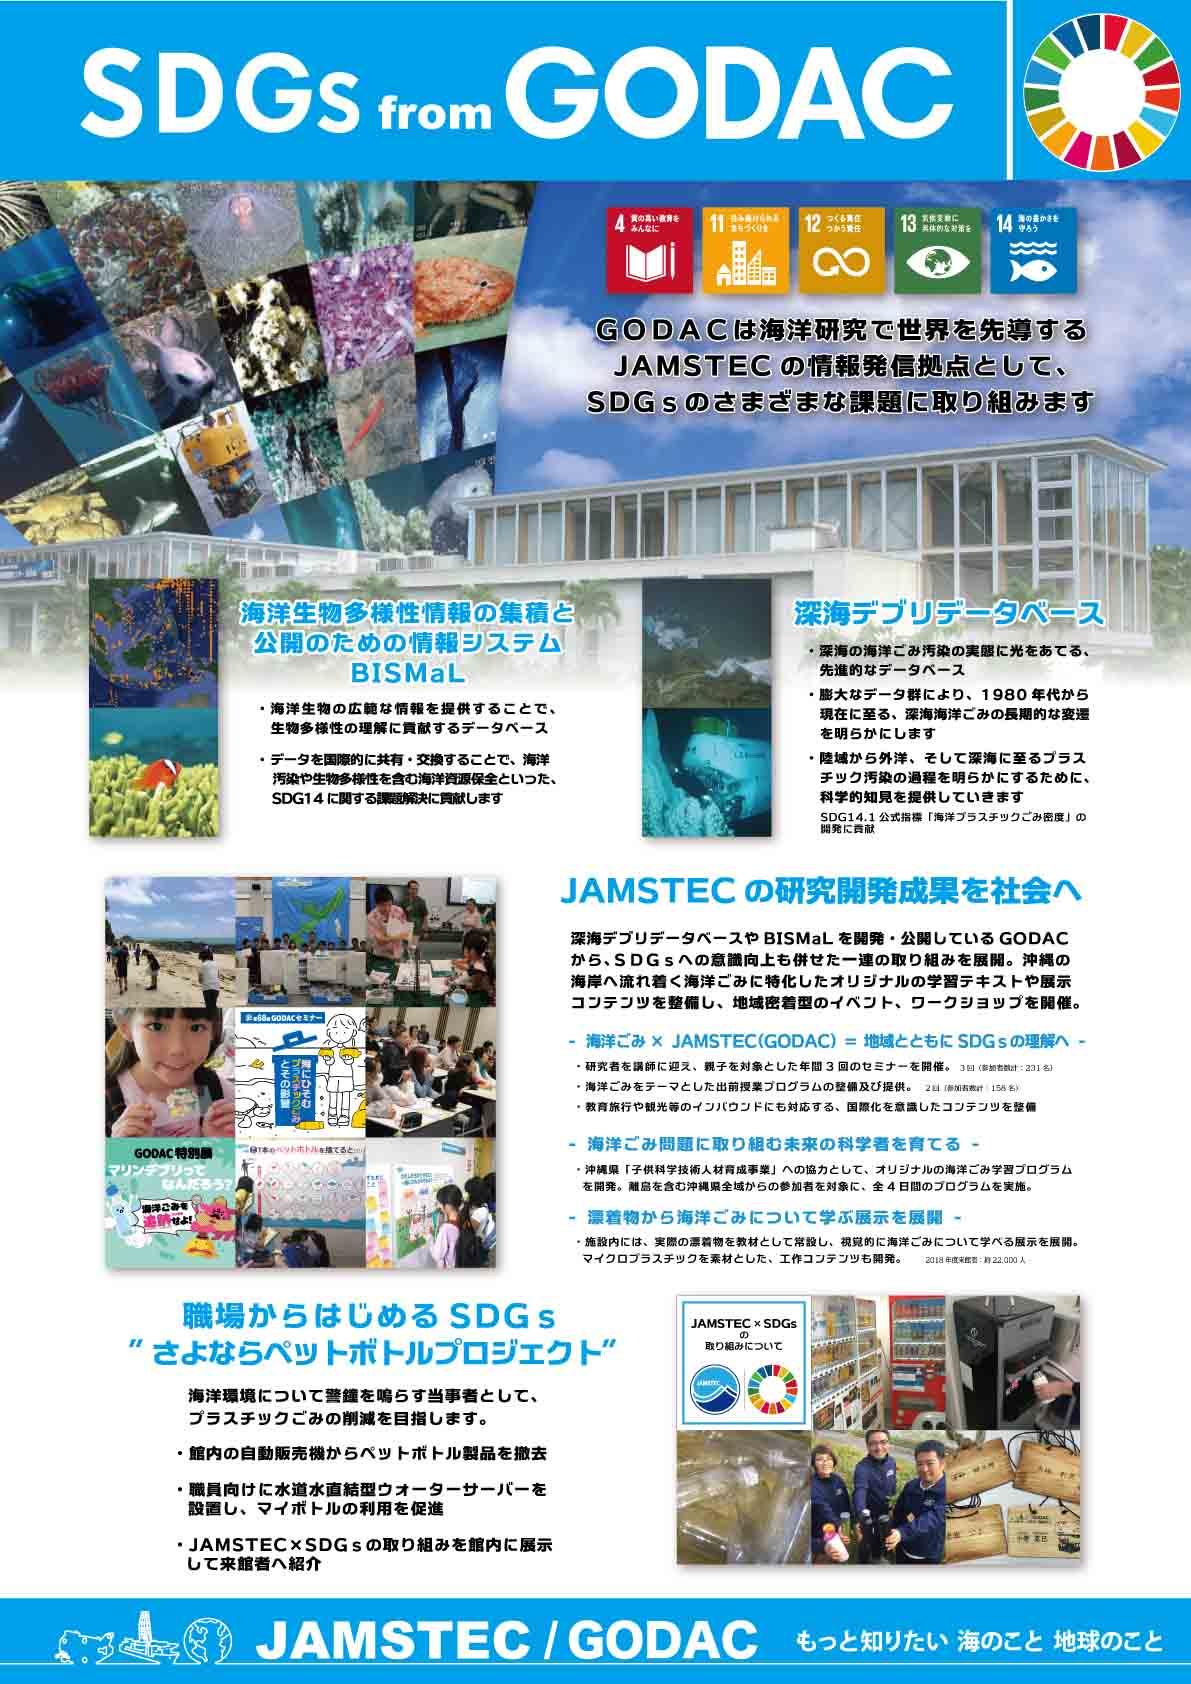 Global Oceanographic Data Center (GODAC) / JAMSTEC